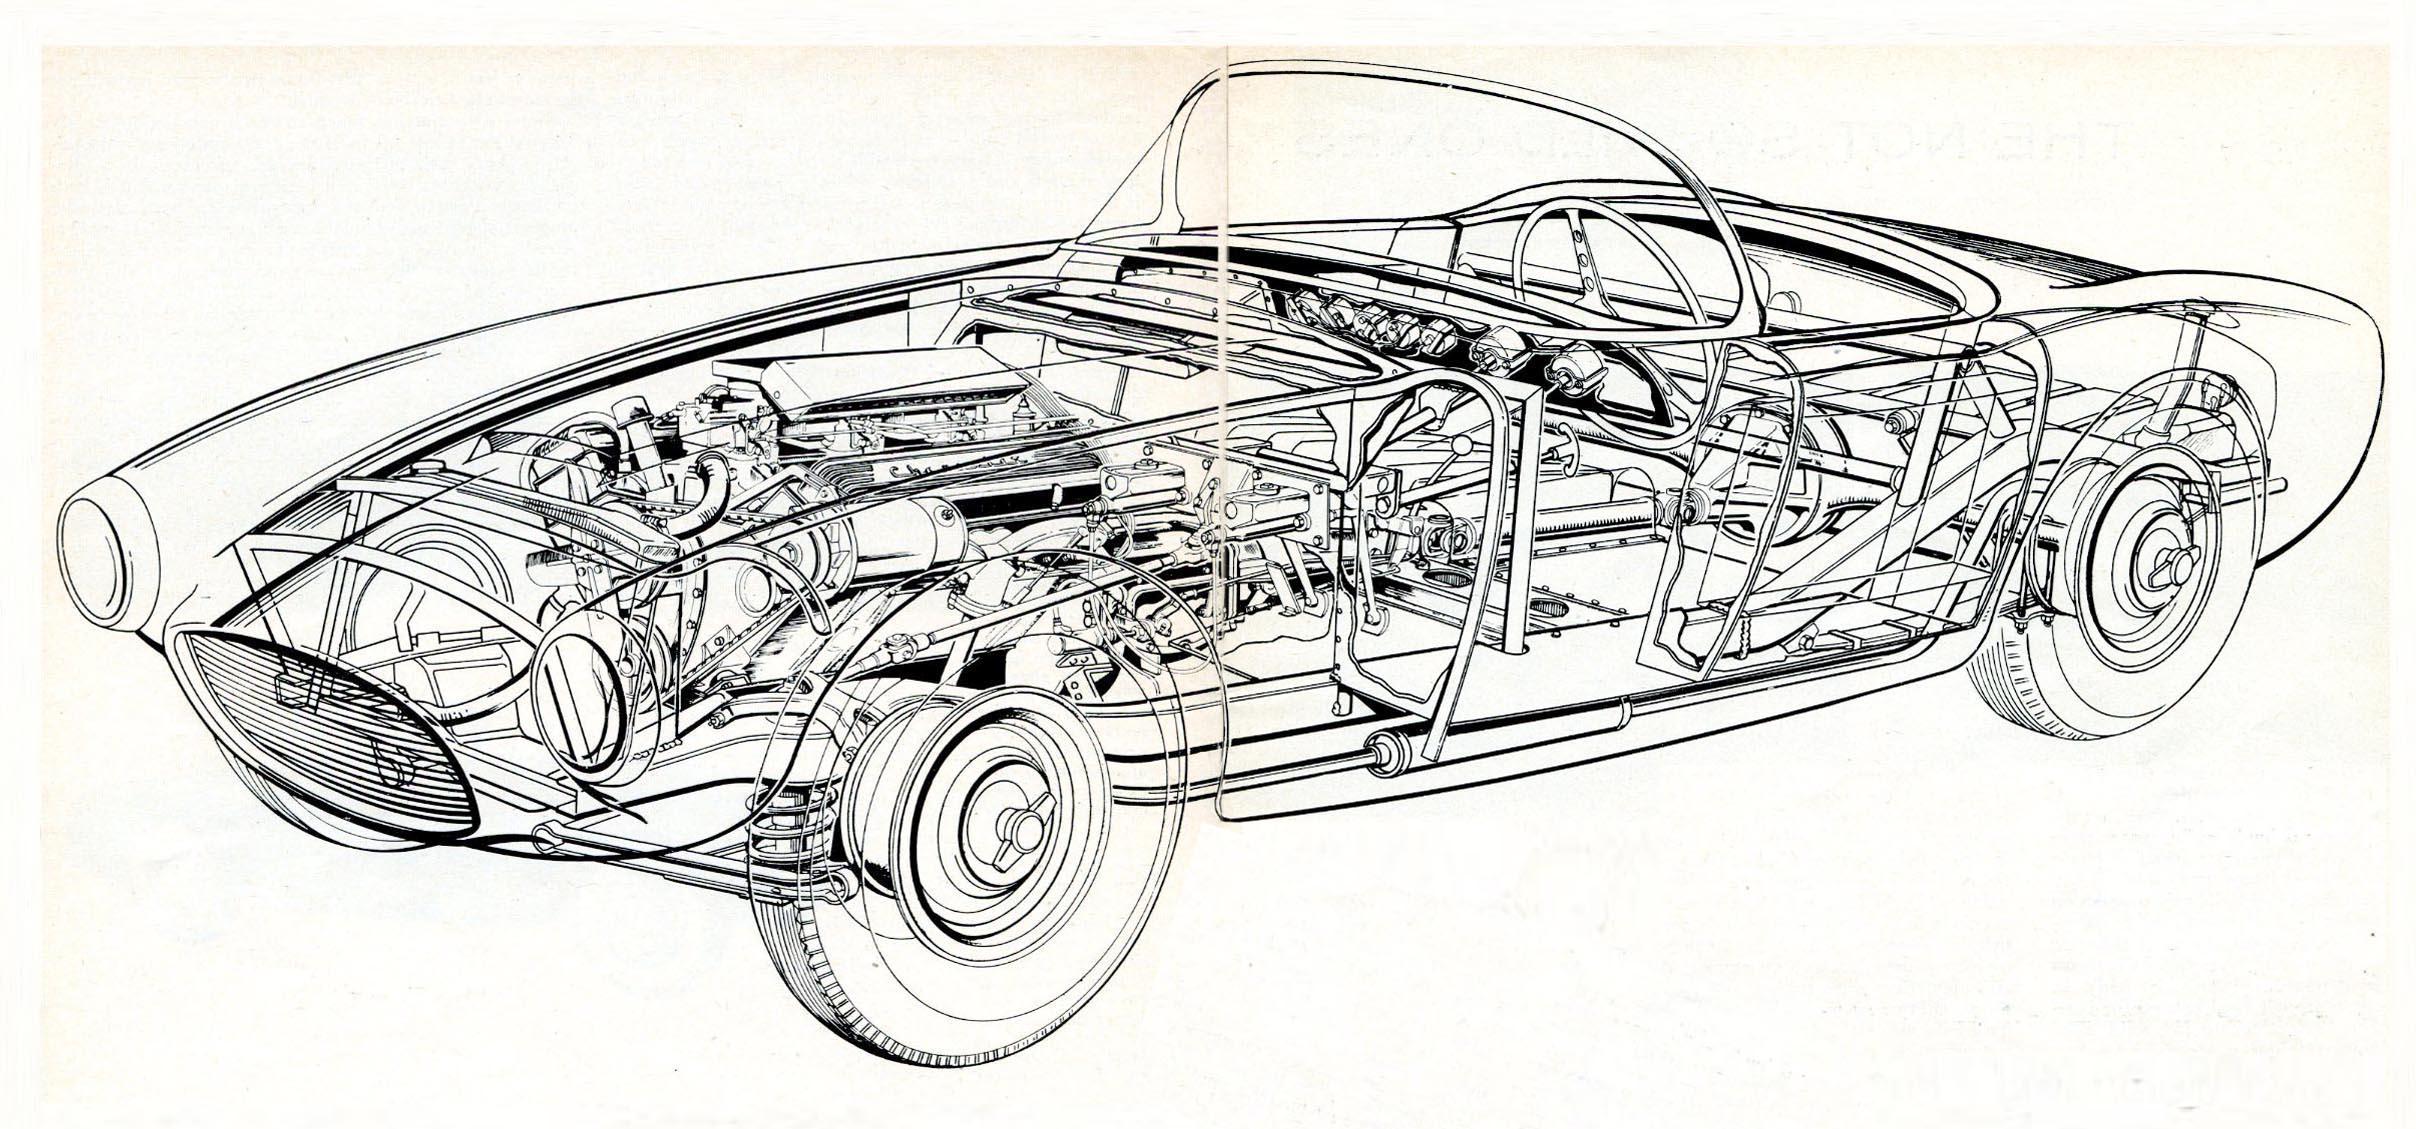 Car Engineering Drawing Pencil Sketch Colorful